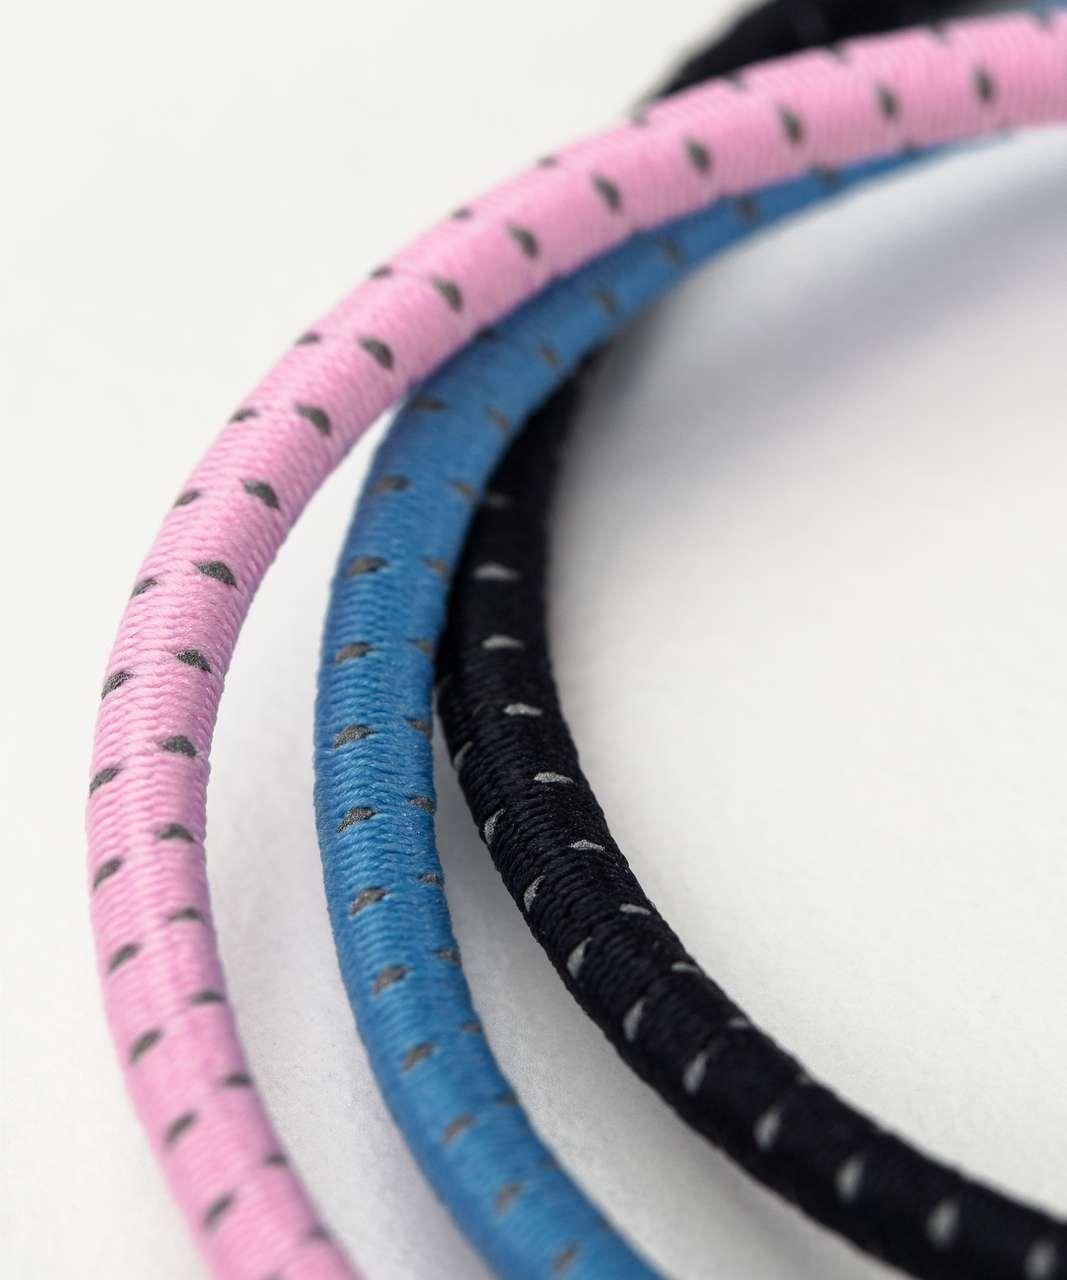 Lululemon Glow On Hair Ties - Midnight Navy / Cherry Blossom Pink / Aero Blue